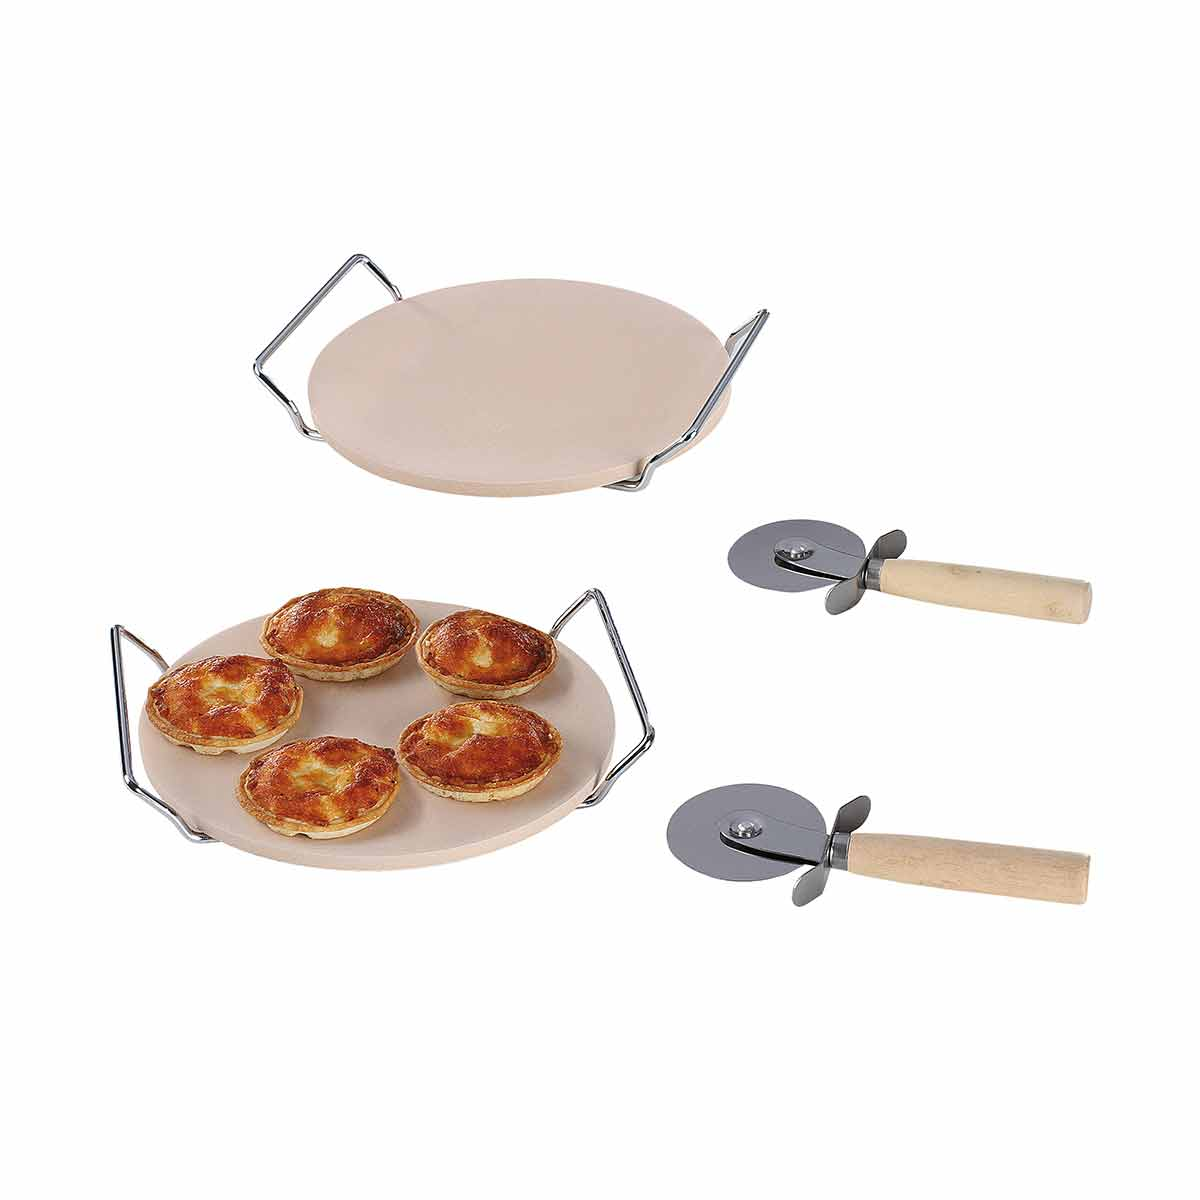 Weber cpierre pizza pour barbecue rond 36 5 cm - Pierre a pizza barbecue gaz ...